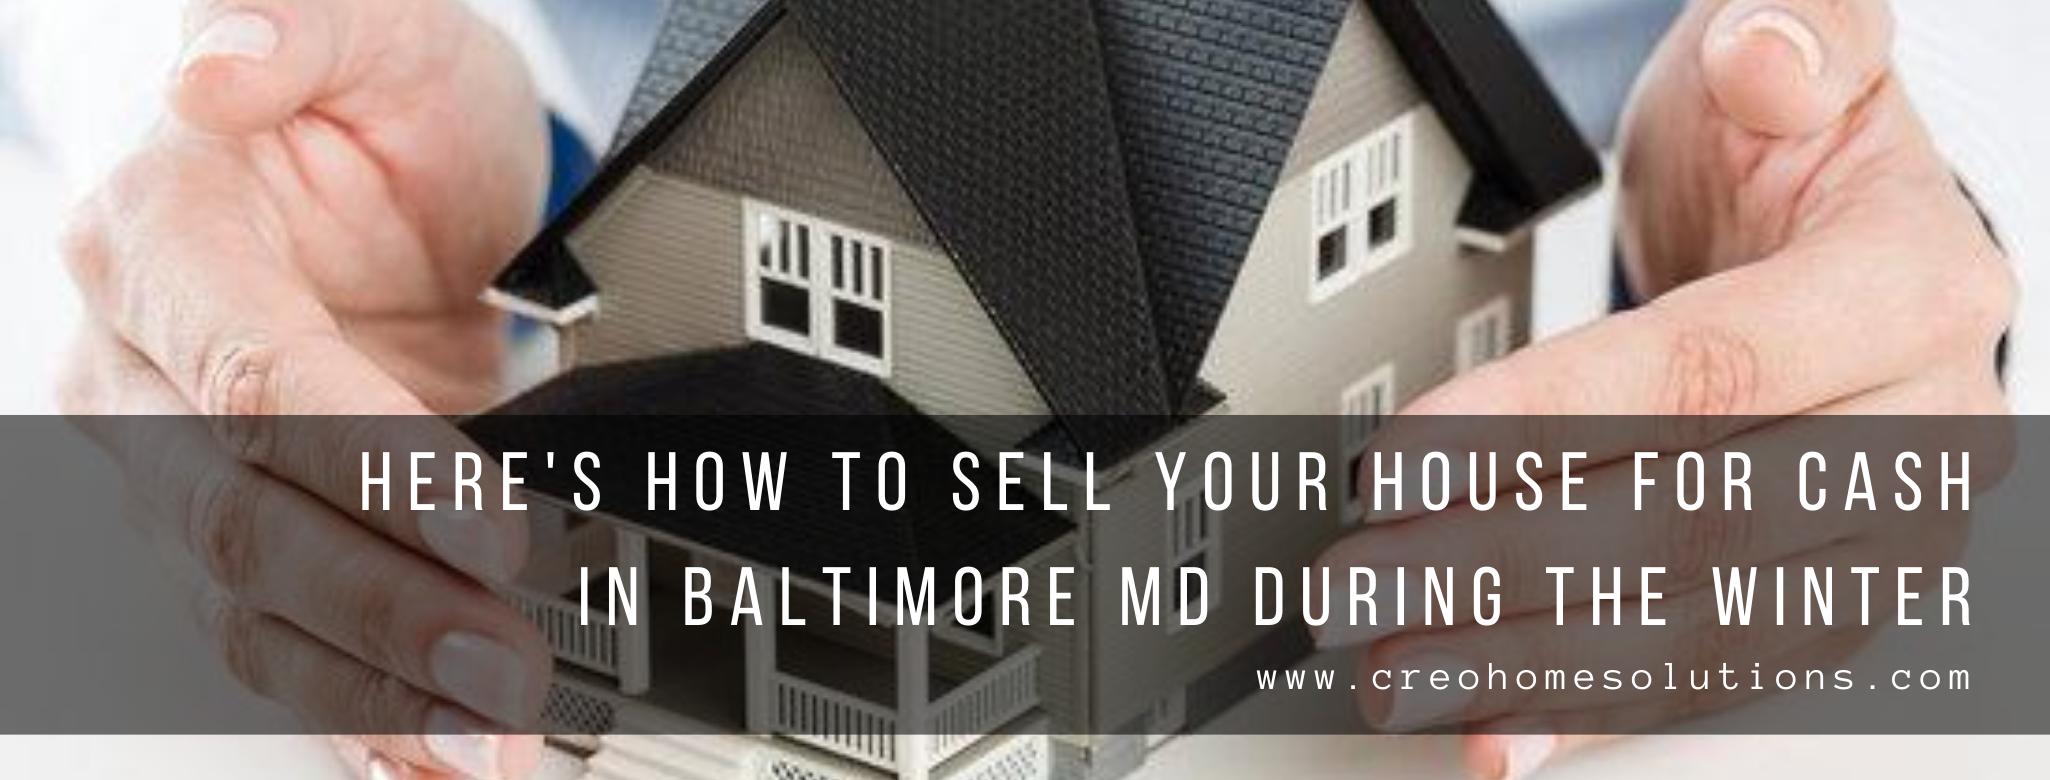 We buy properties in Baltimore MD